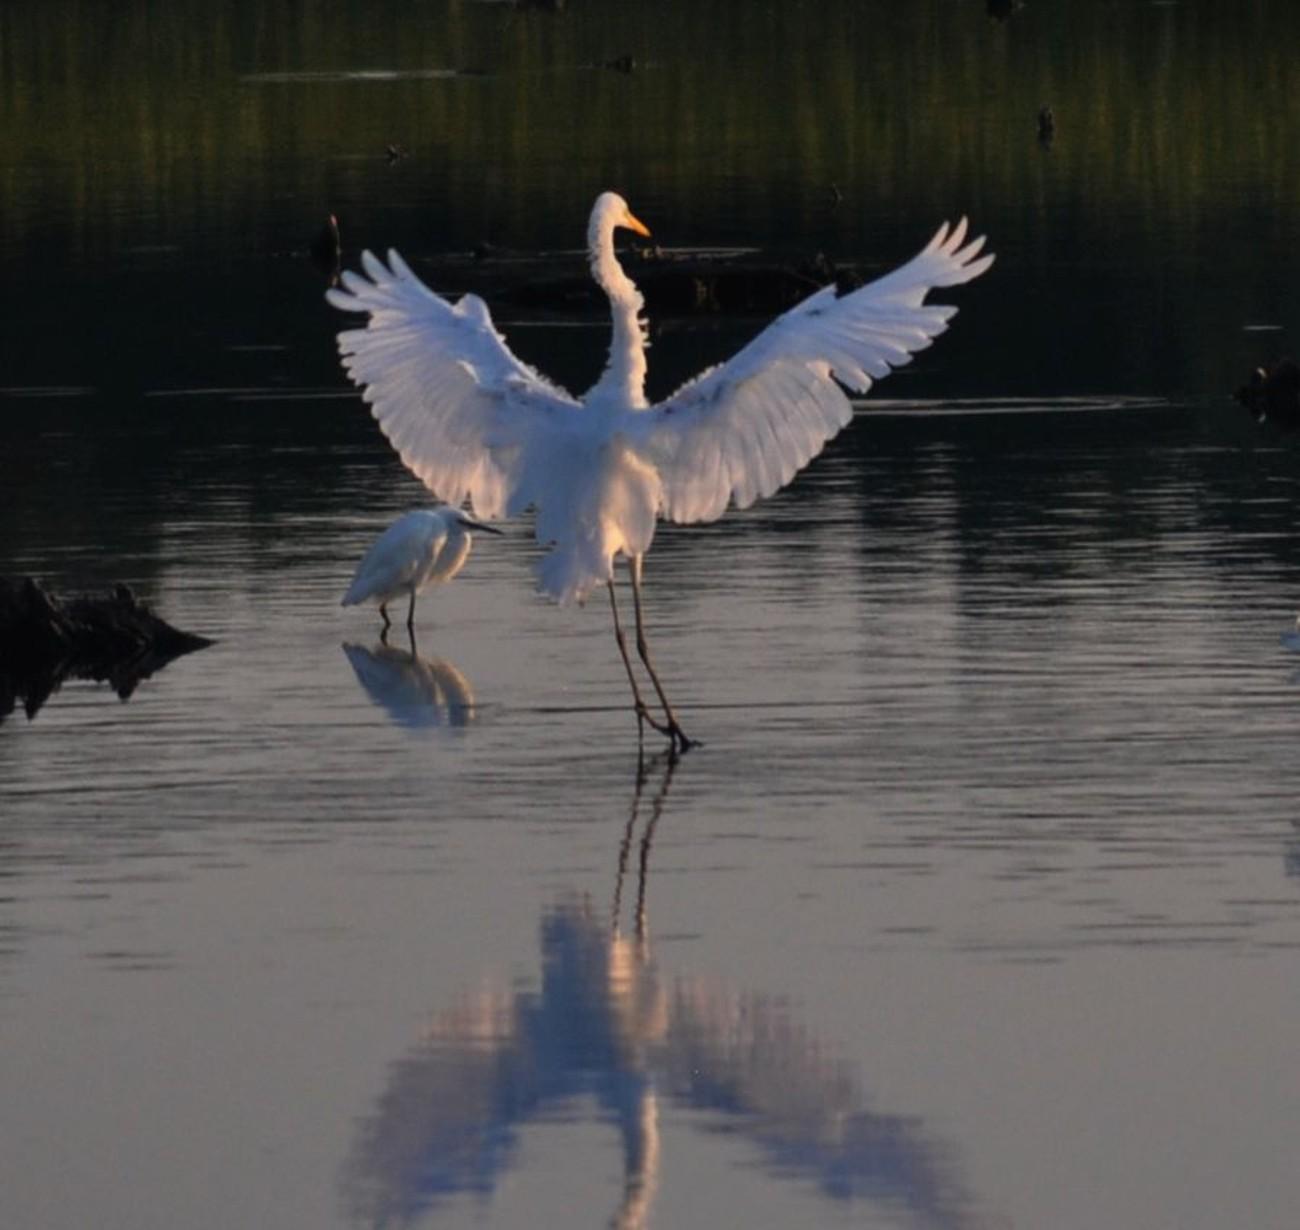 Bombay Hook National Wildlife Refuge Smyrna, Delaware Liepsic River,, Blackbear Swamp,